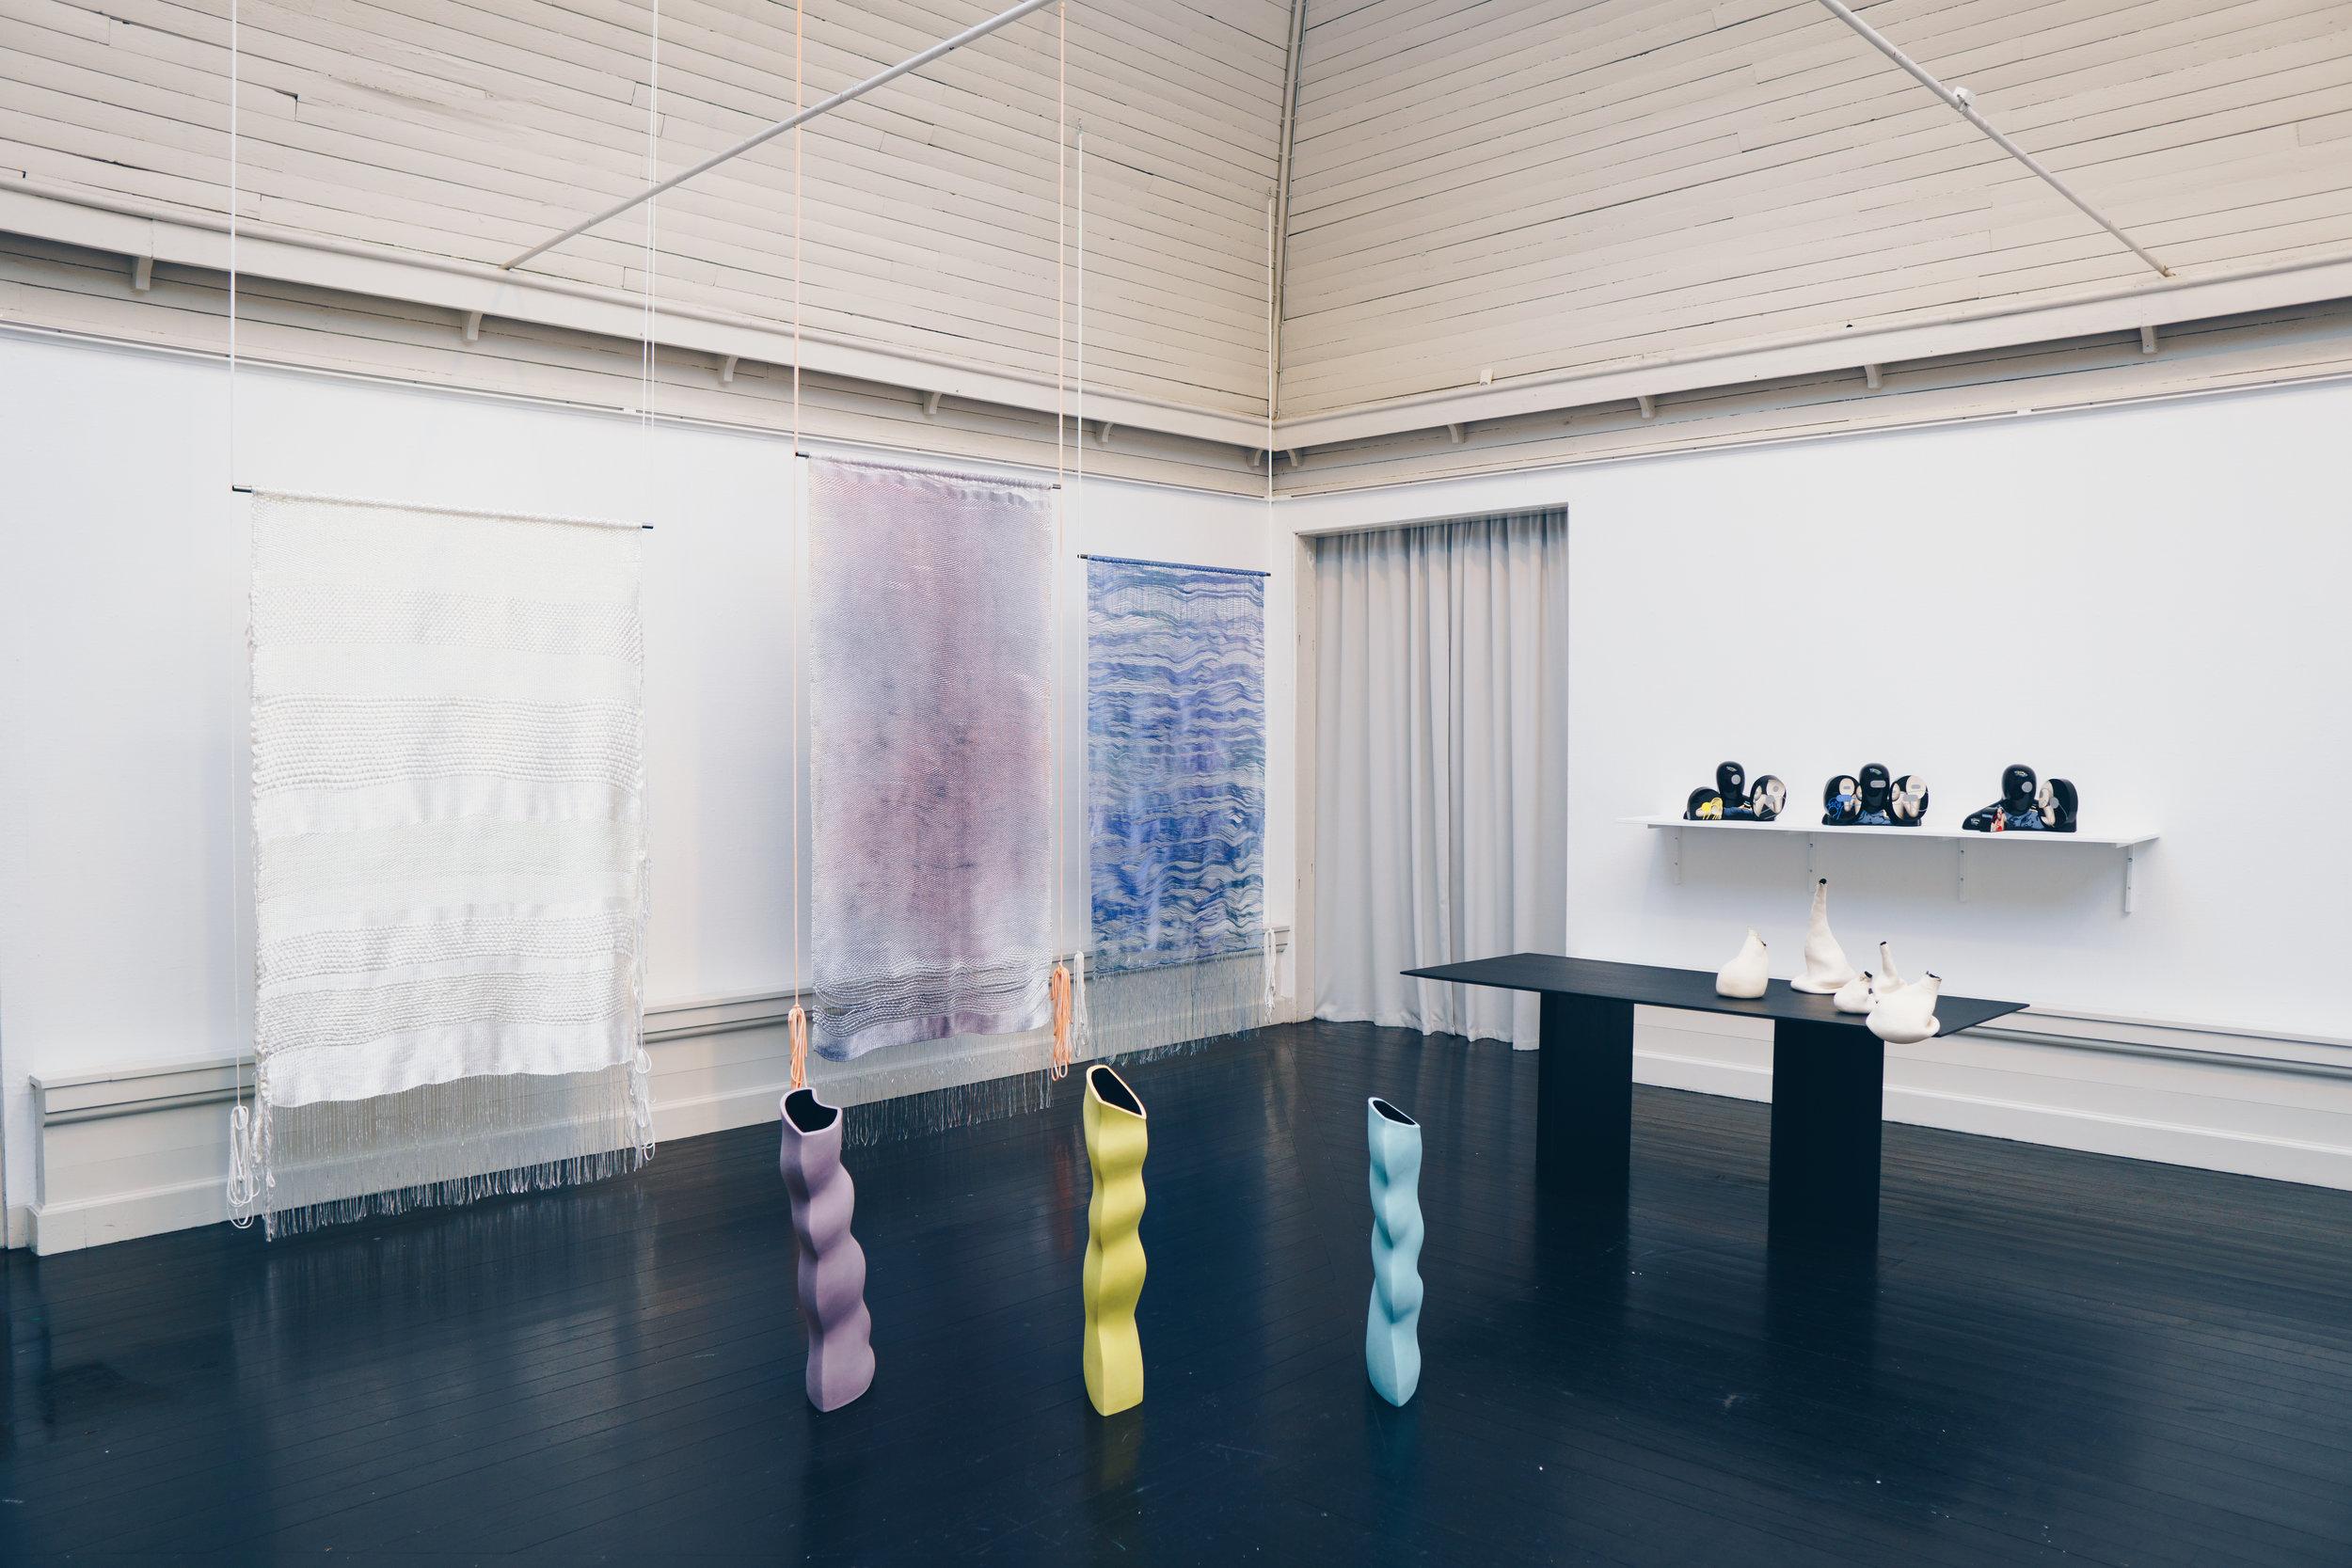 CHART Design 2018_Galleri Format Oslo_Photo by Joakim Züger.jpg